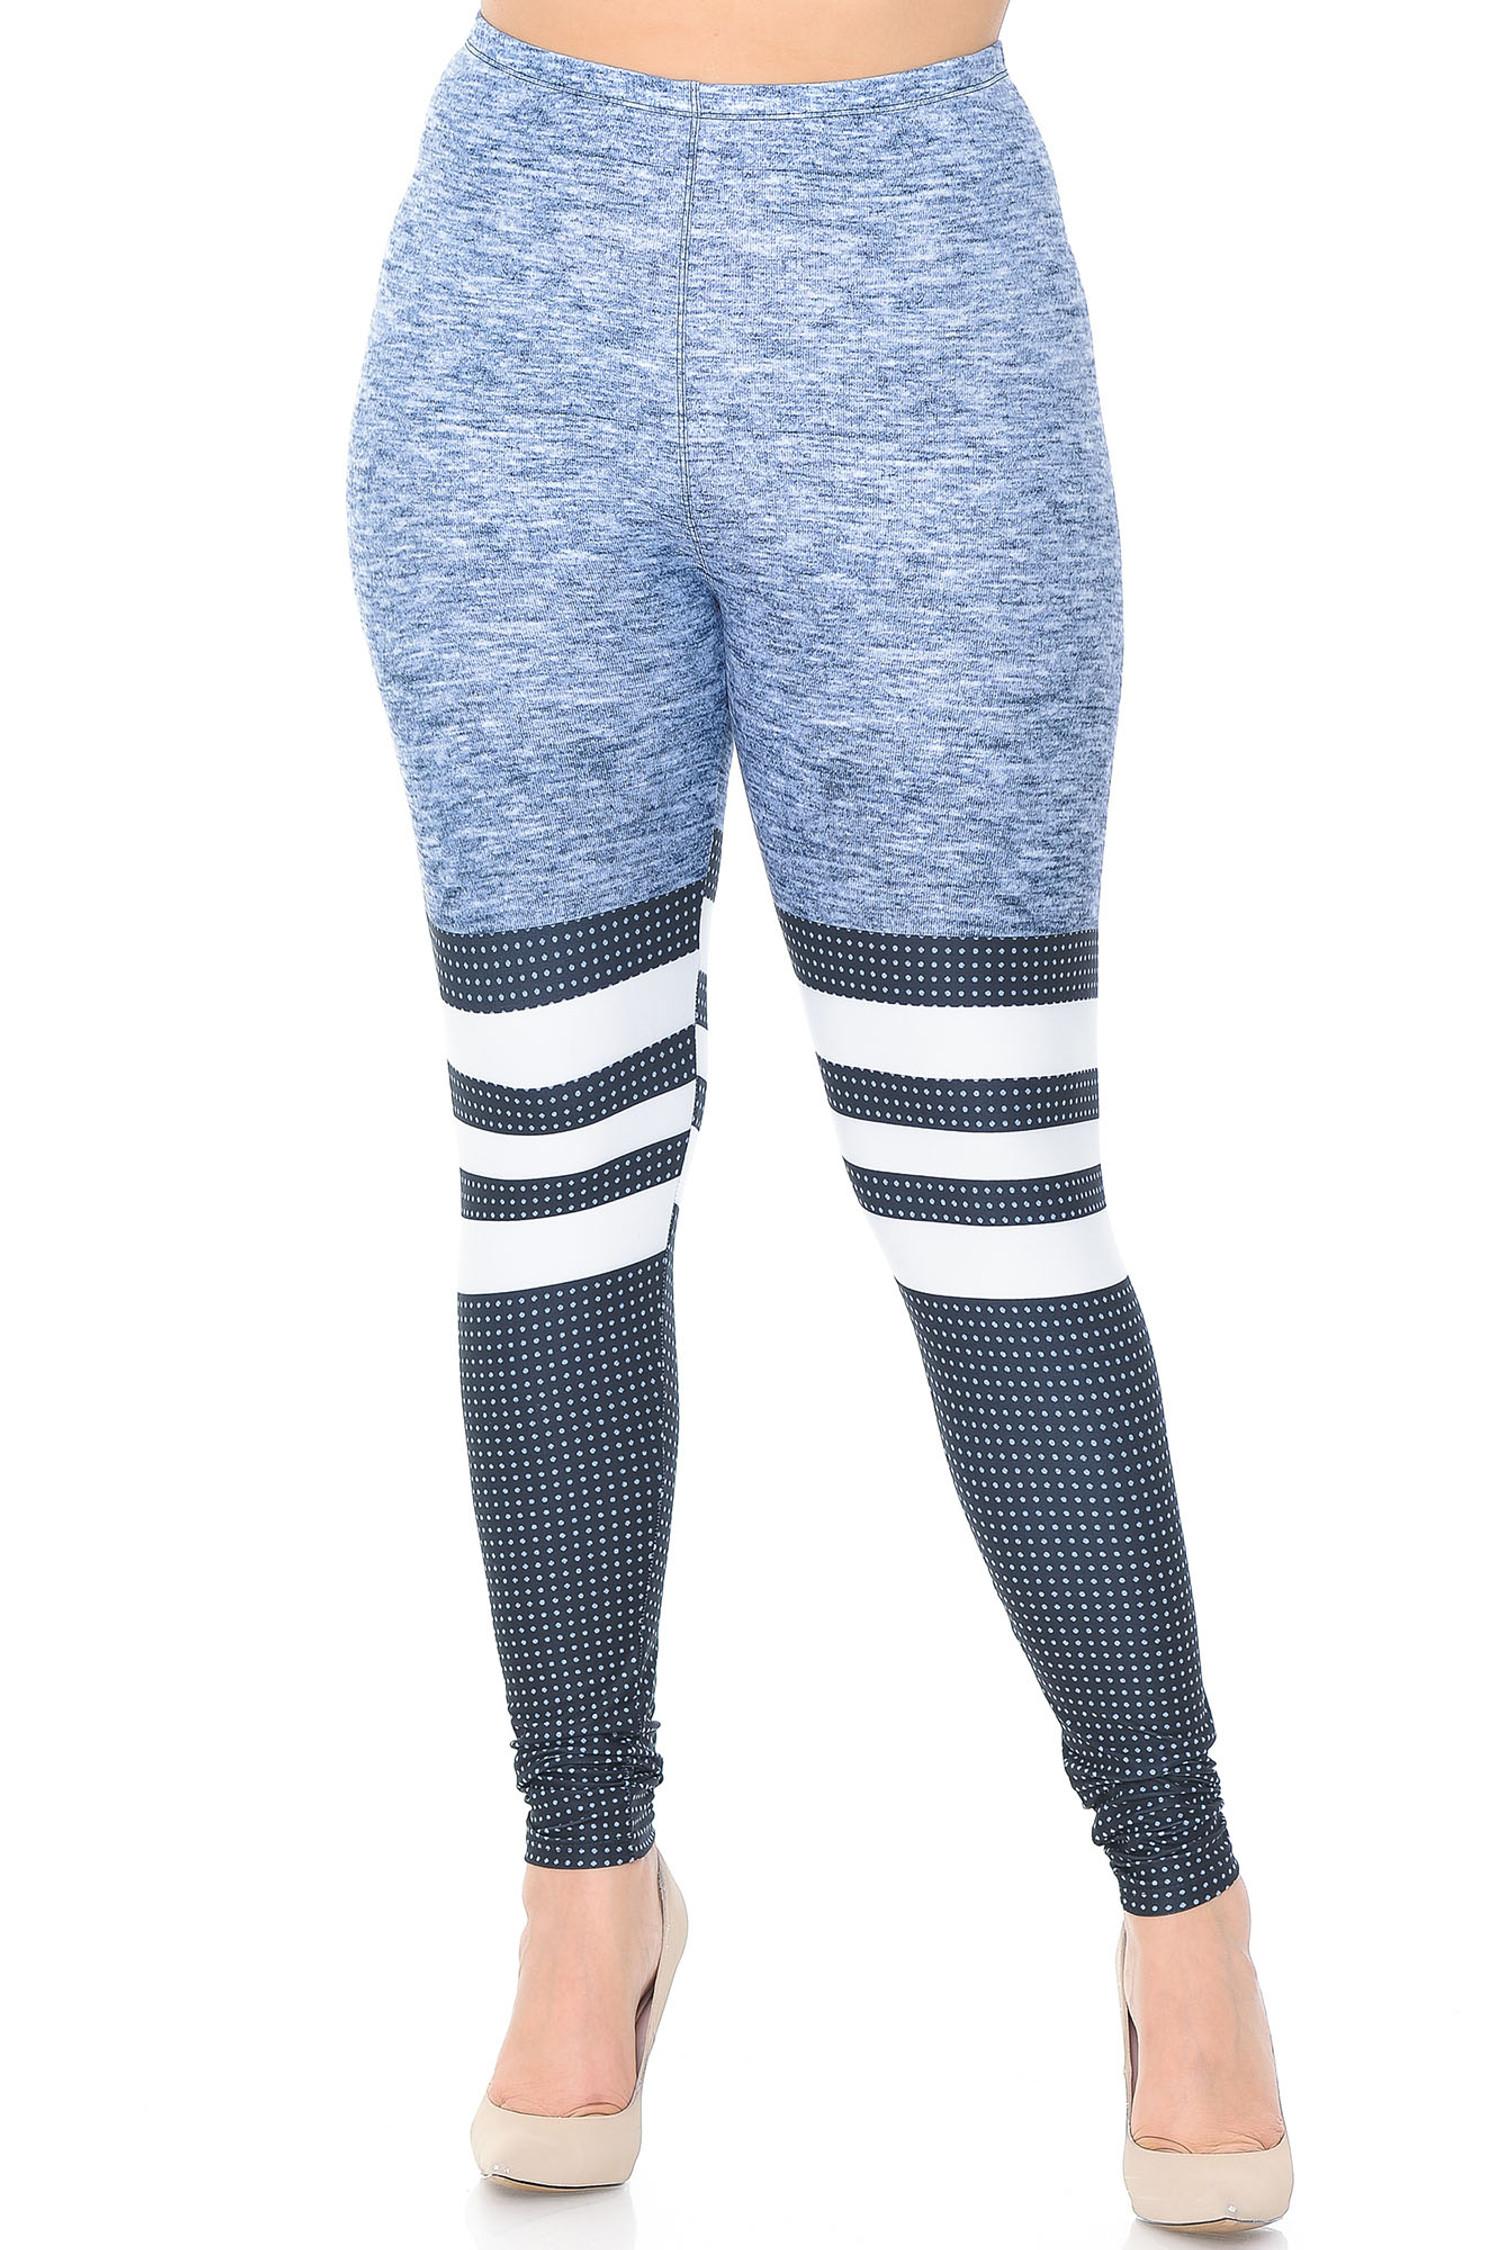 Creamy Soft Split Sport Extra Plus Size Leggings - 3X-5X - USA Fashion™